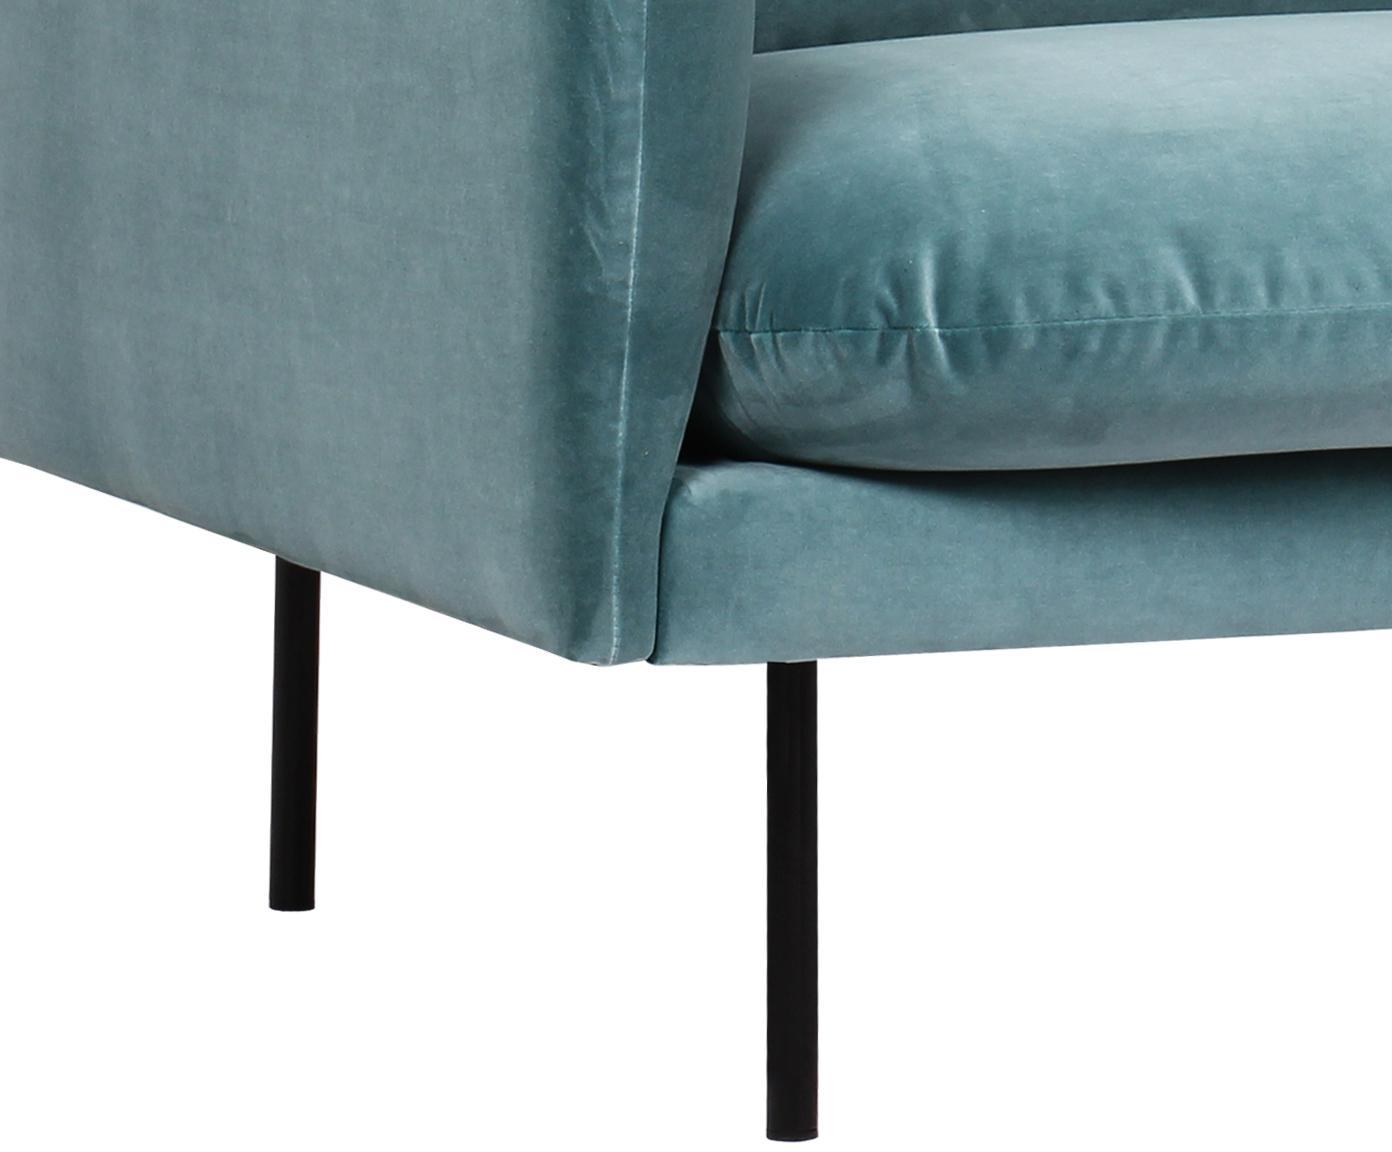 Fluwelen hoekbank Moby, Bekleding: fluweel (hoogwaardige pol, Frame: massief grenenhout, Poten: gepoedercoat metaal, Turquoise, B 280 x D 160 cm